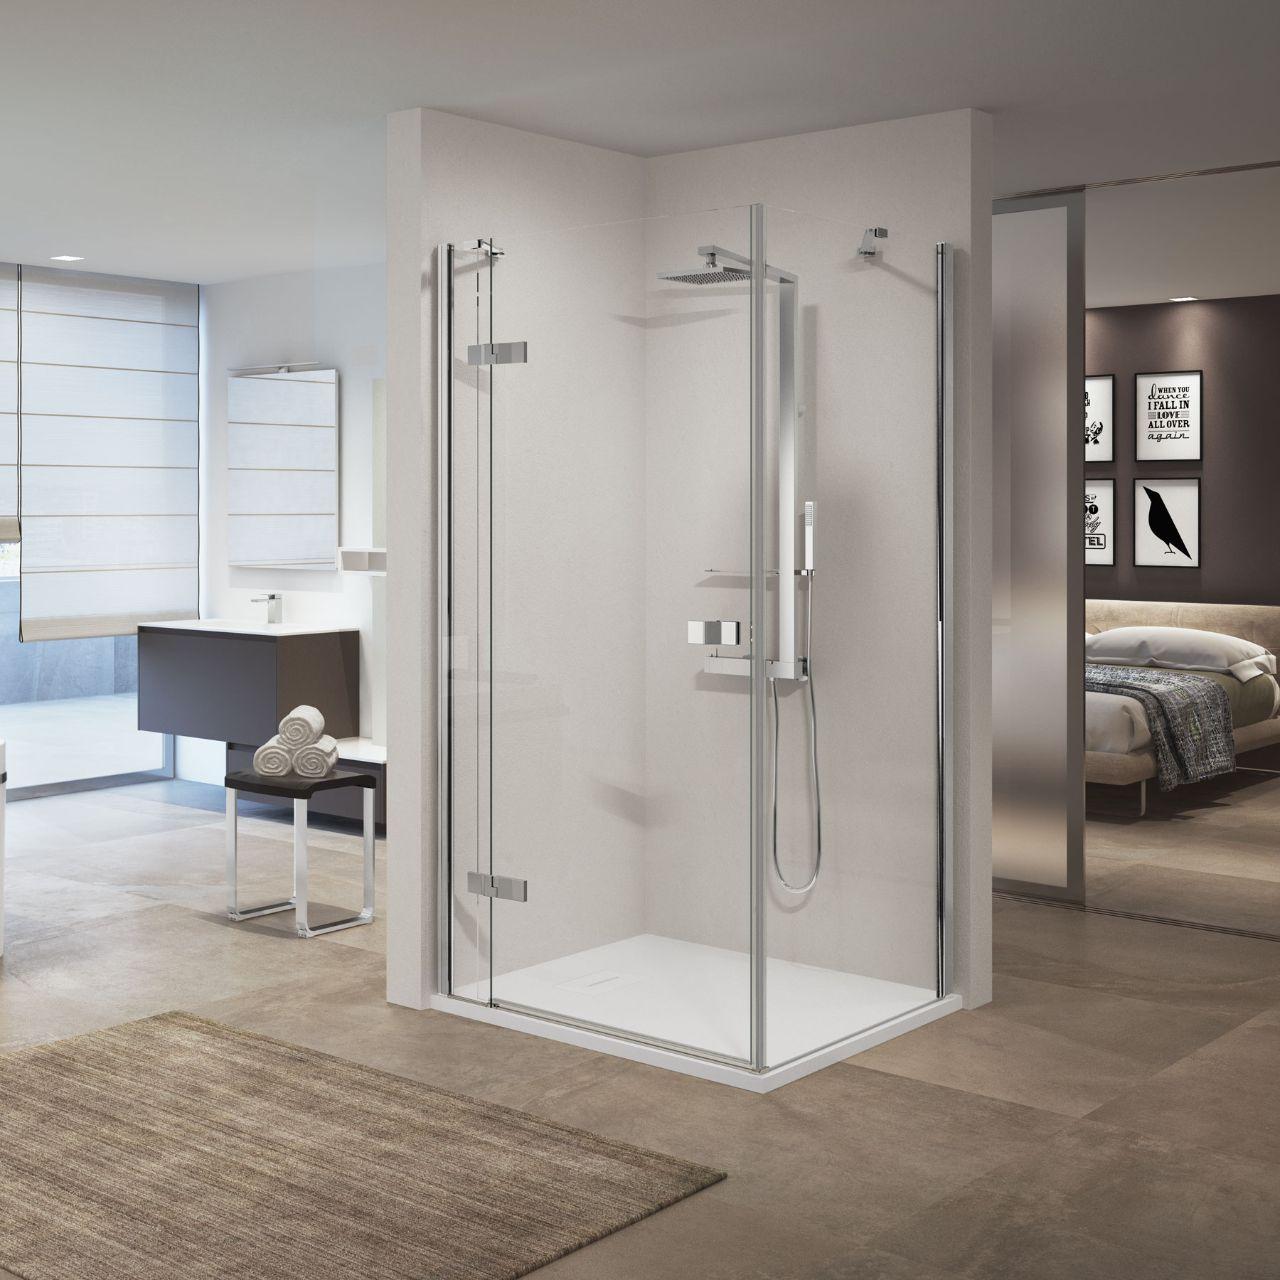 Cabinas De Ducha Gala:Mamparas de ducha Gala 1 G+F – Novellini